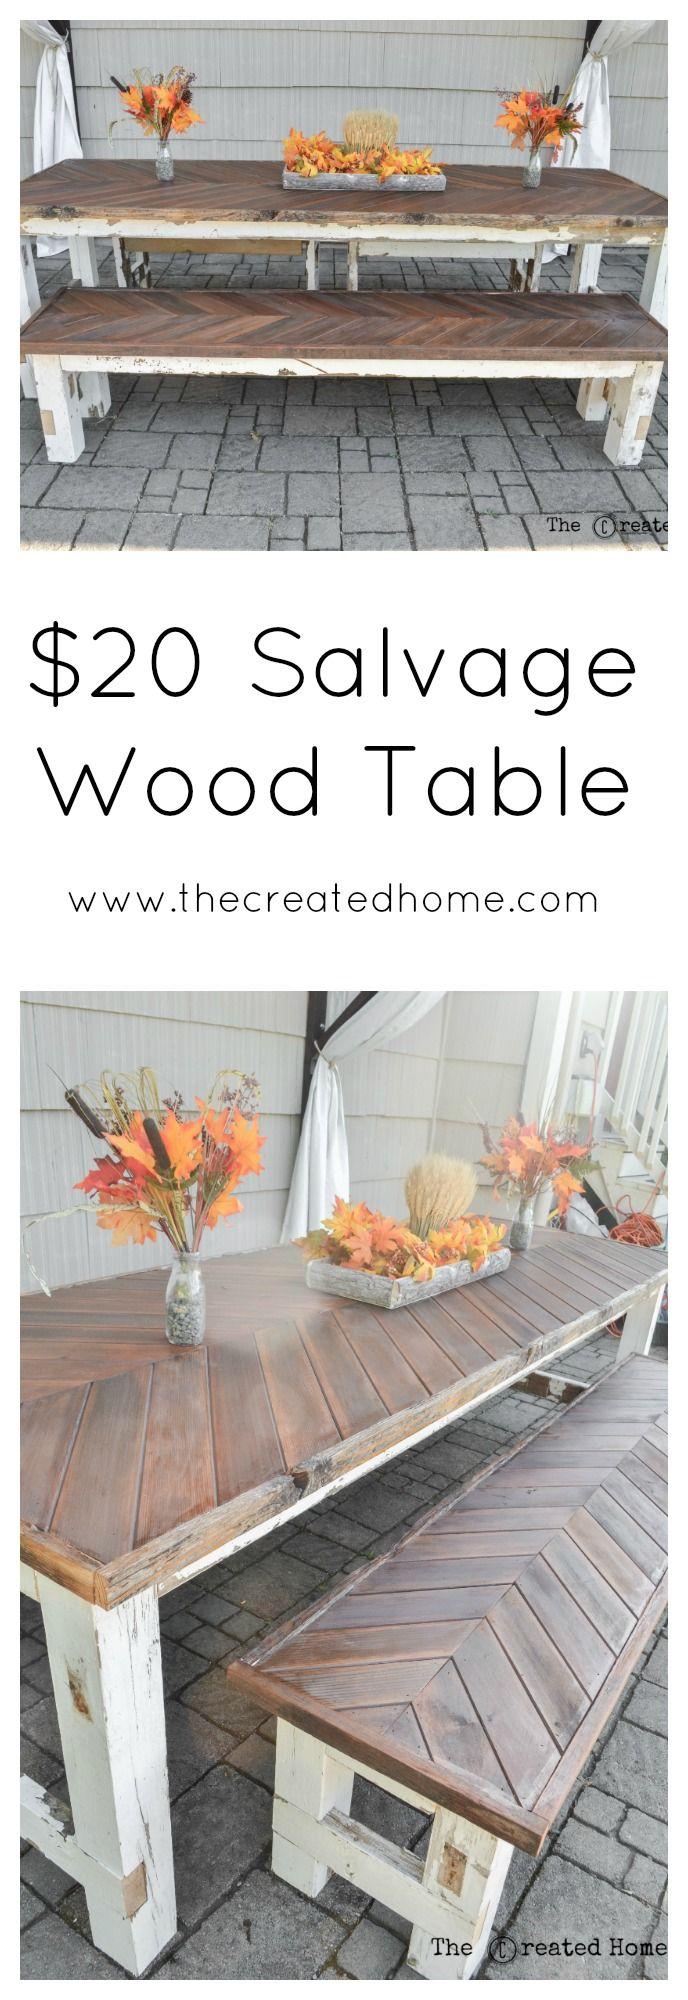 $20 Salvage Wood Table